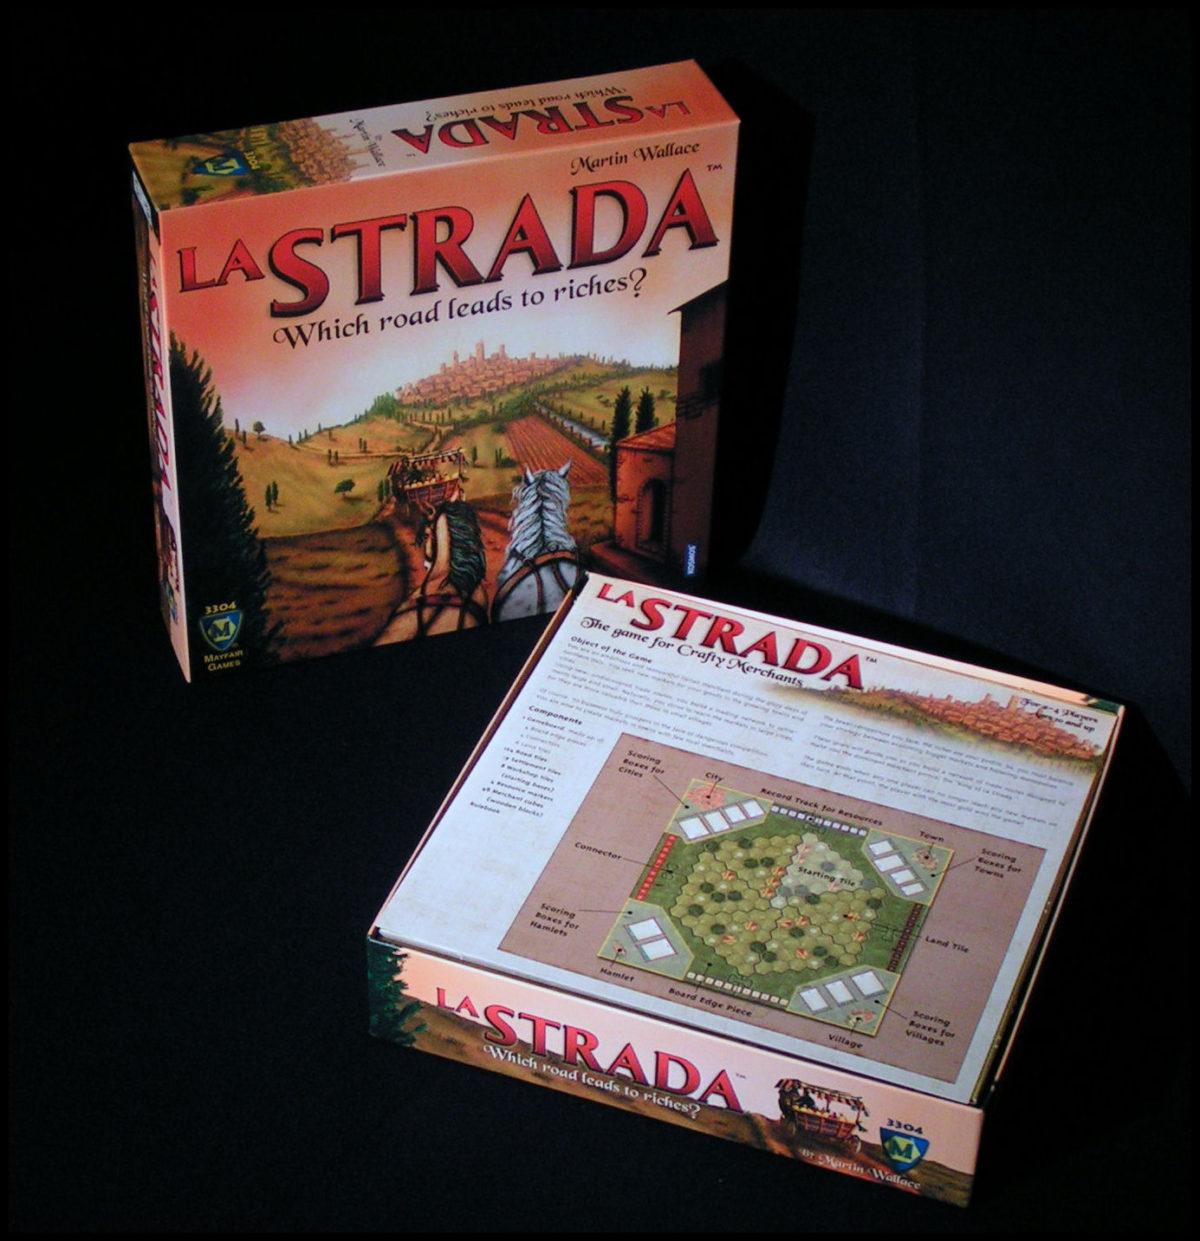 La Strada - Opening The Box